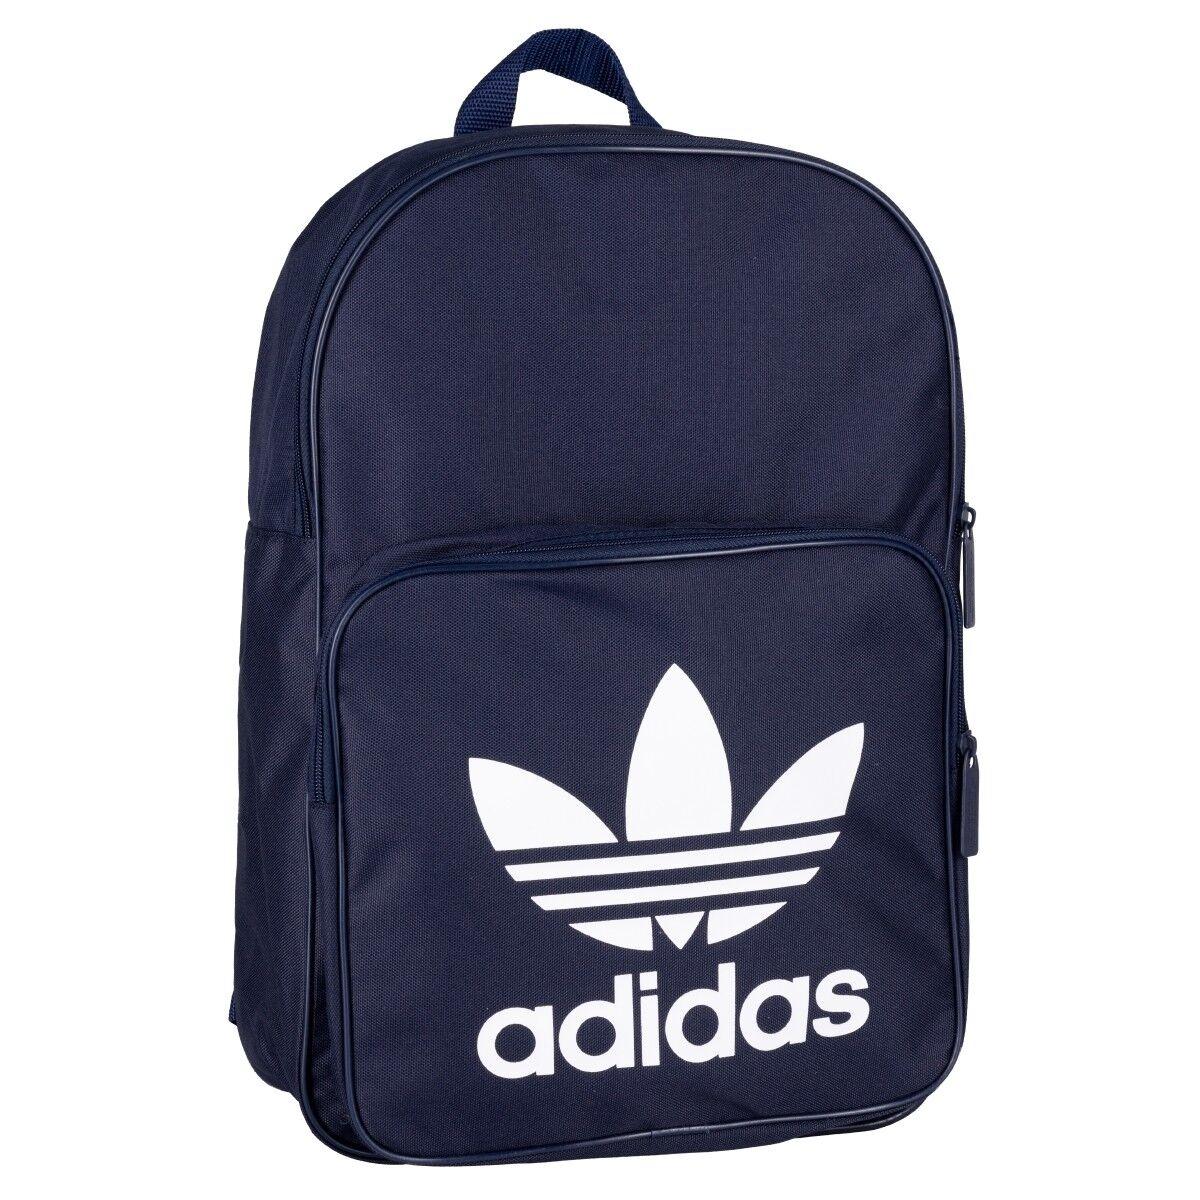 Adidas BP Classic Trefoil Rucksack Backpack Sport Freizeit Schule Tasche DW5189